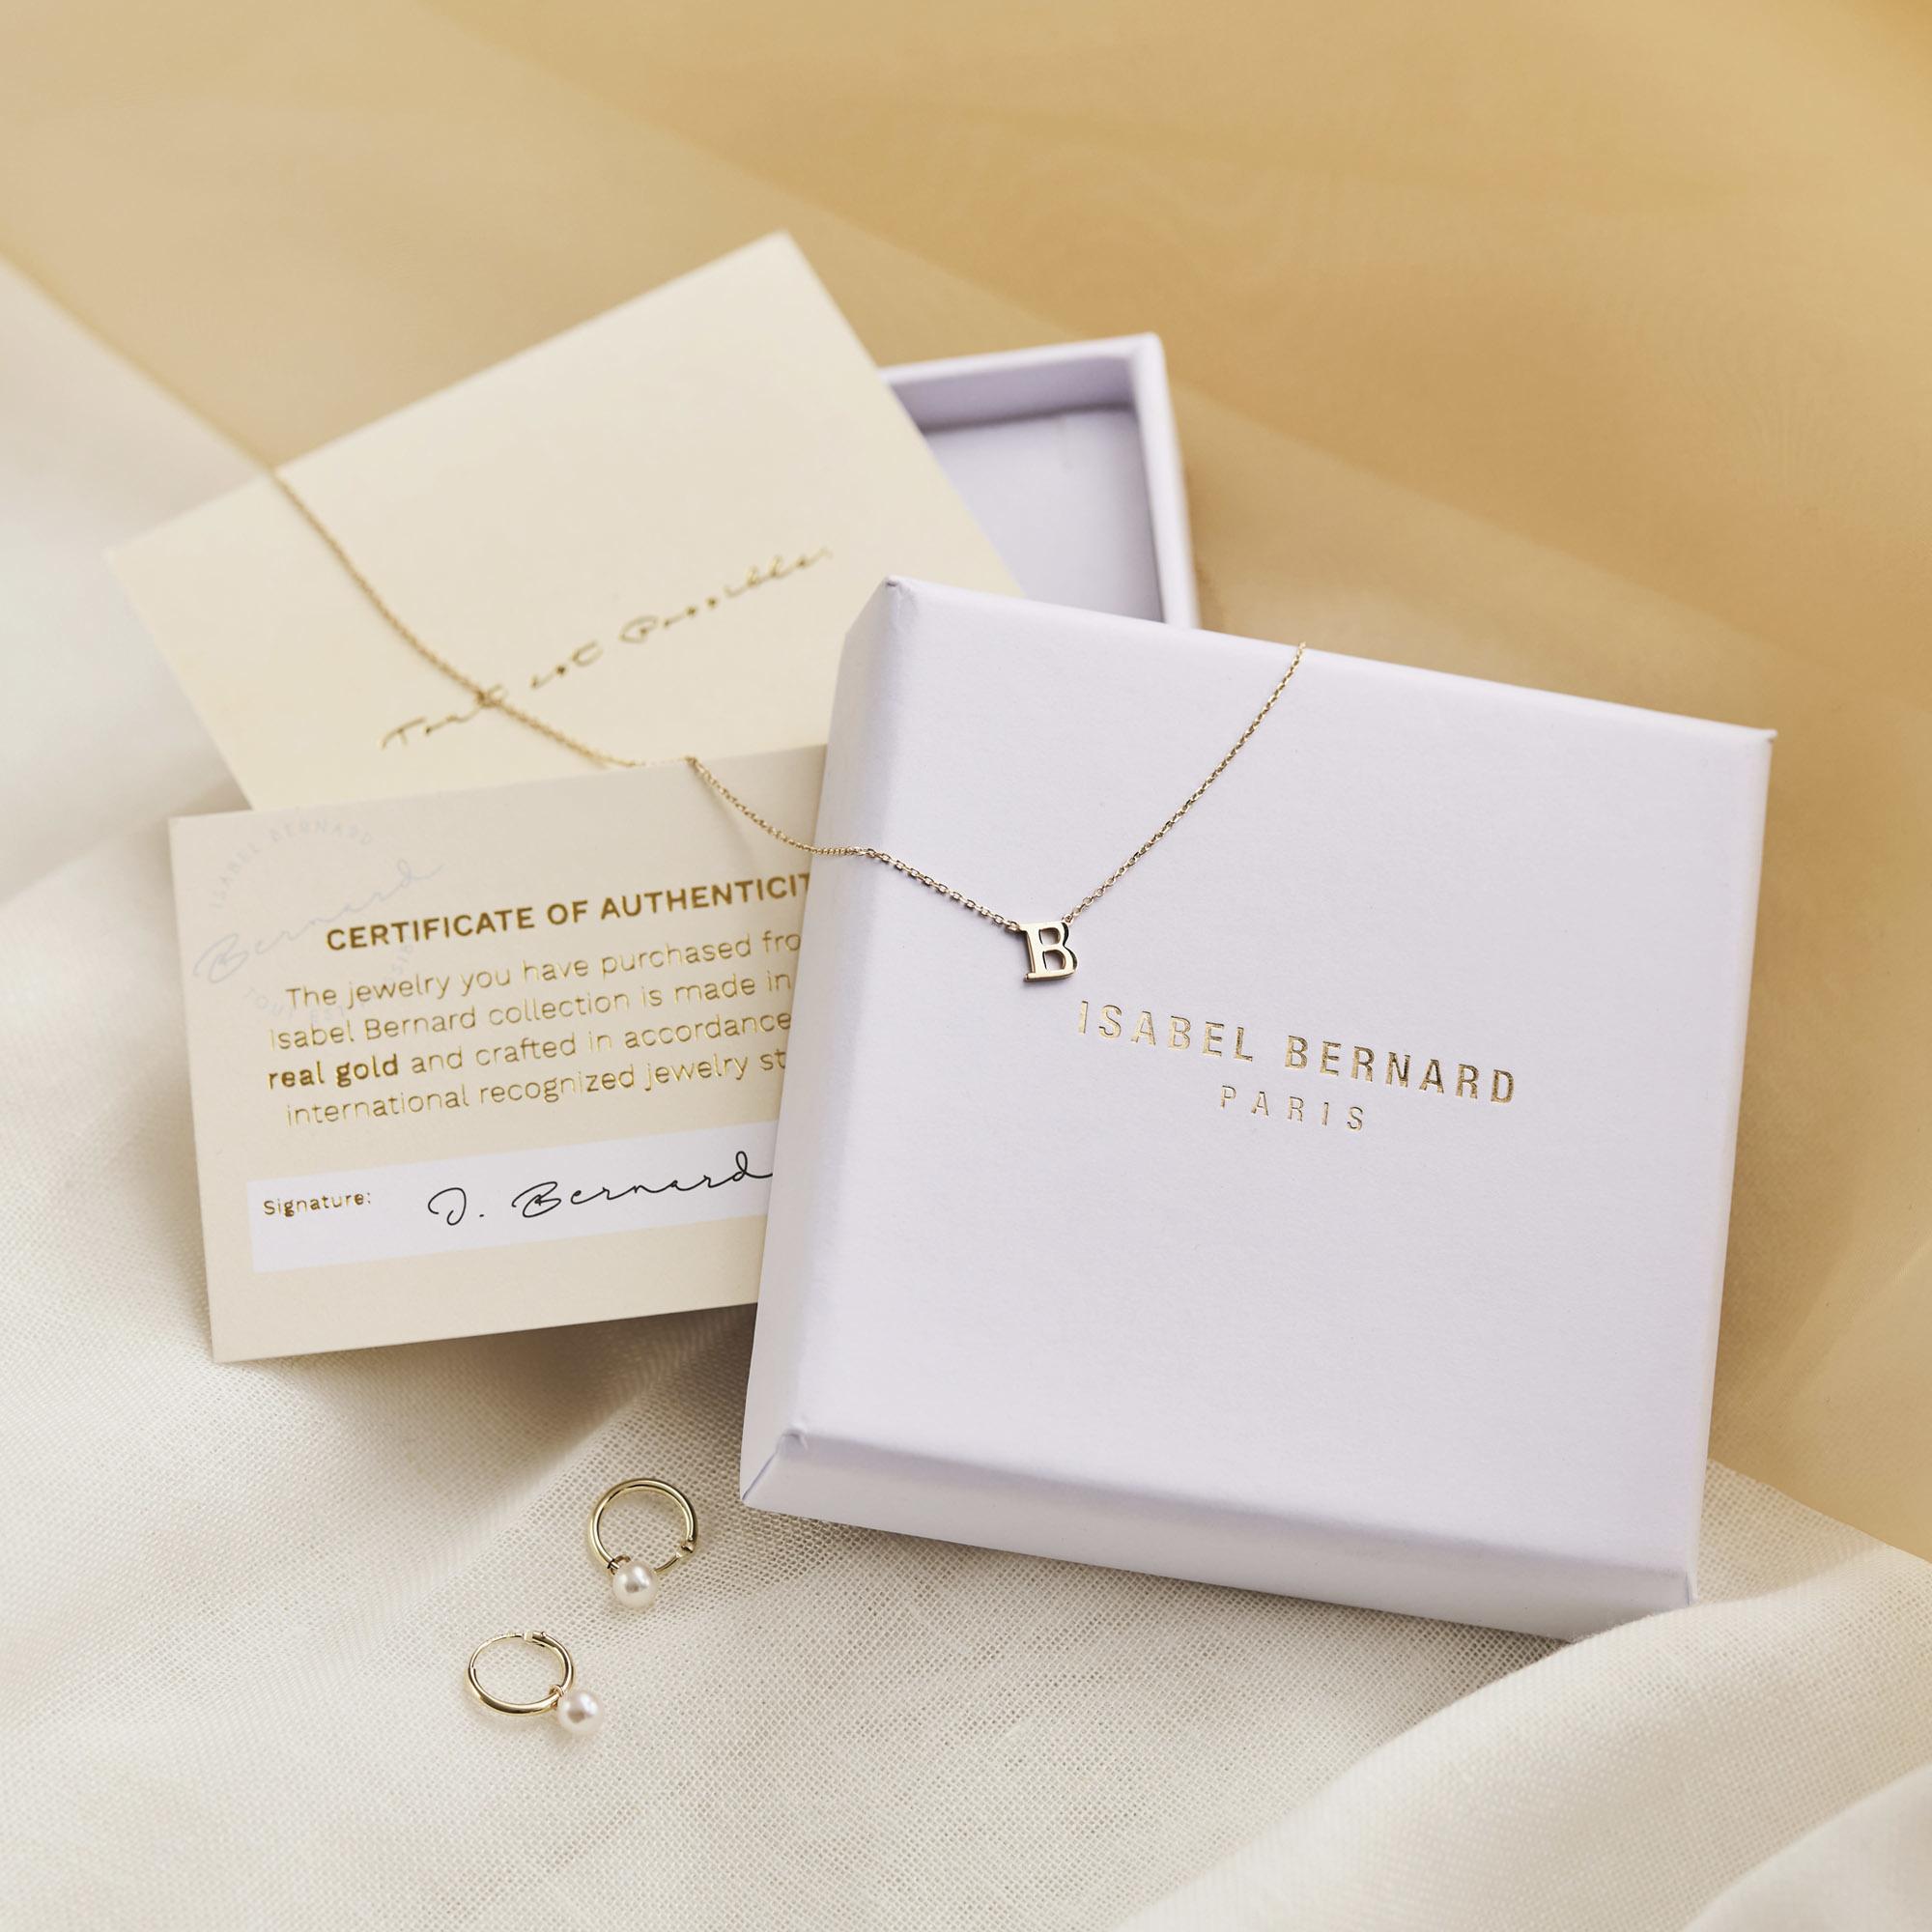 Isabel Bernard Saint Germain Chloé collana con iniziale in oro bianco 14 carati